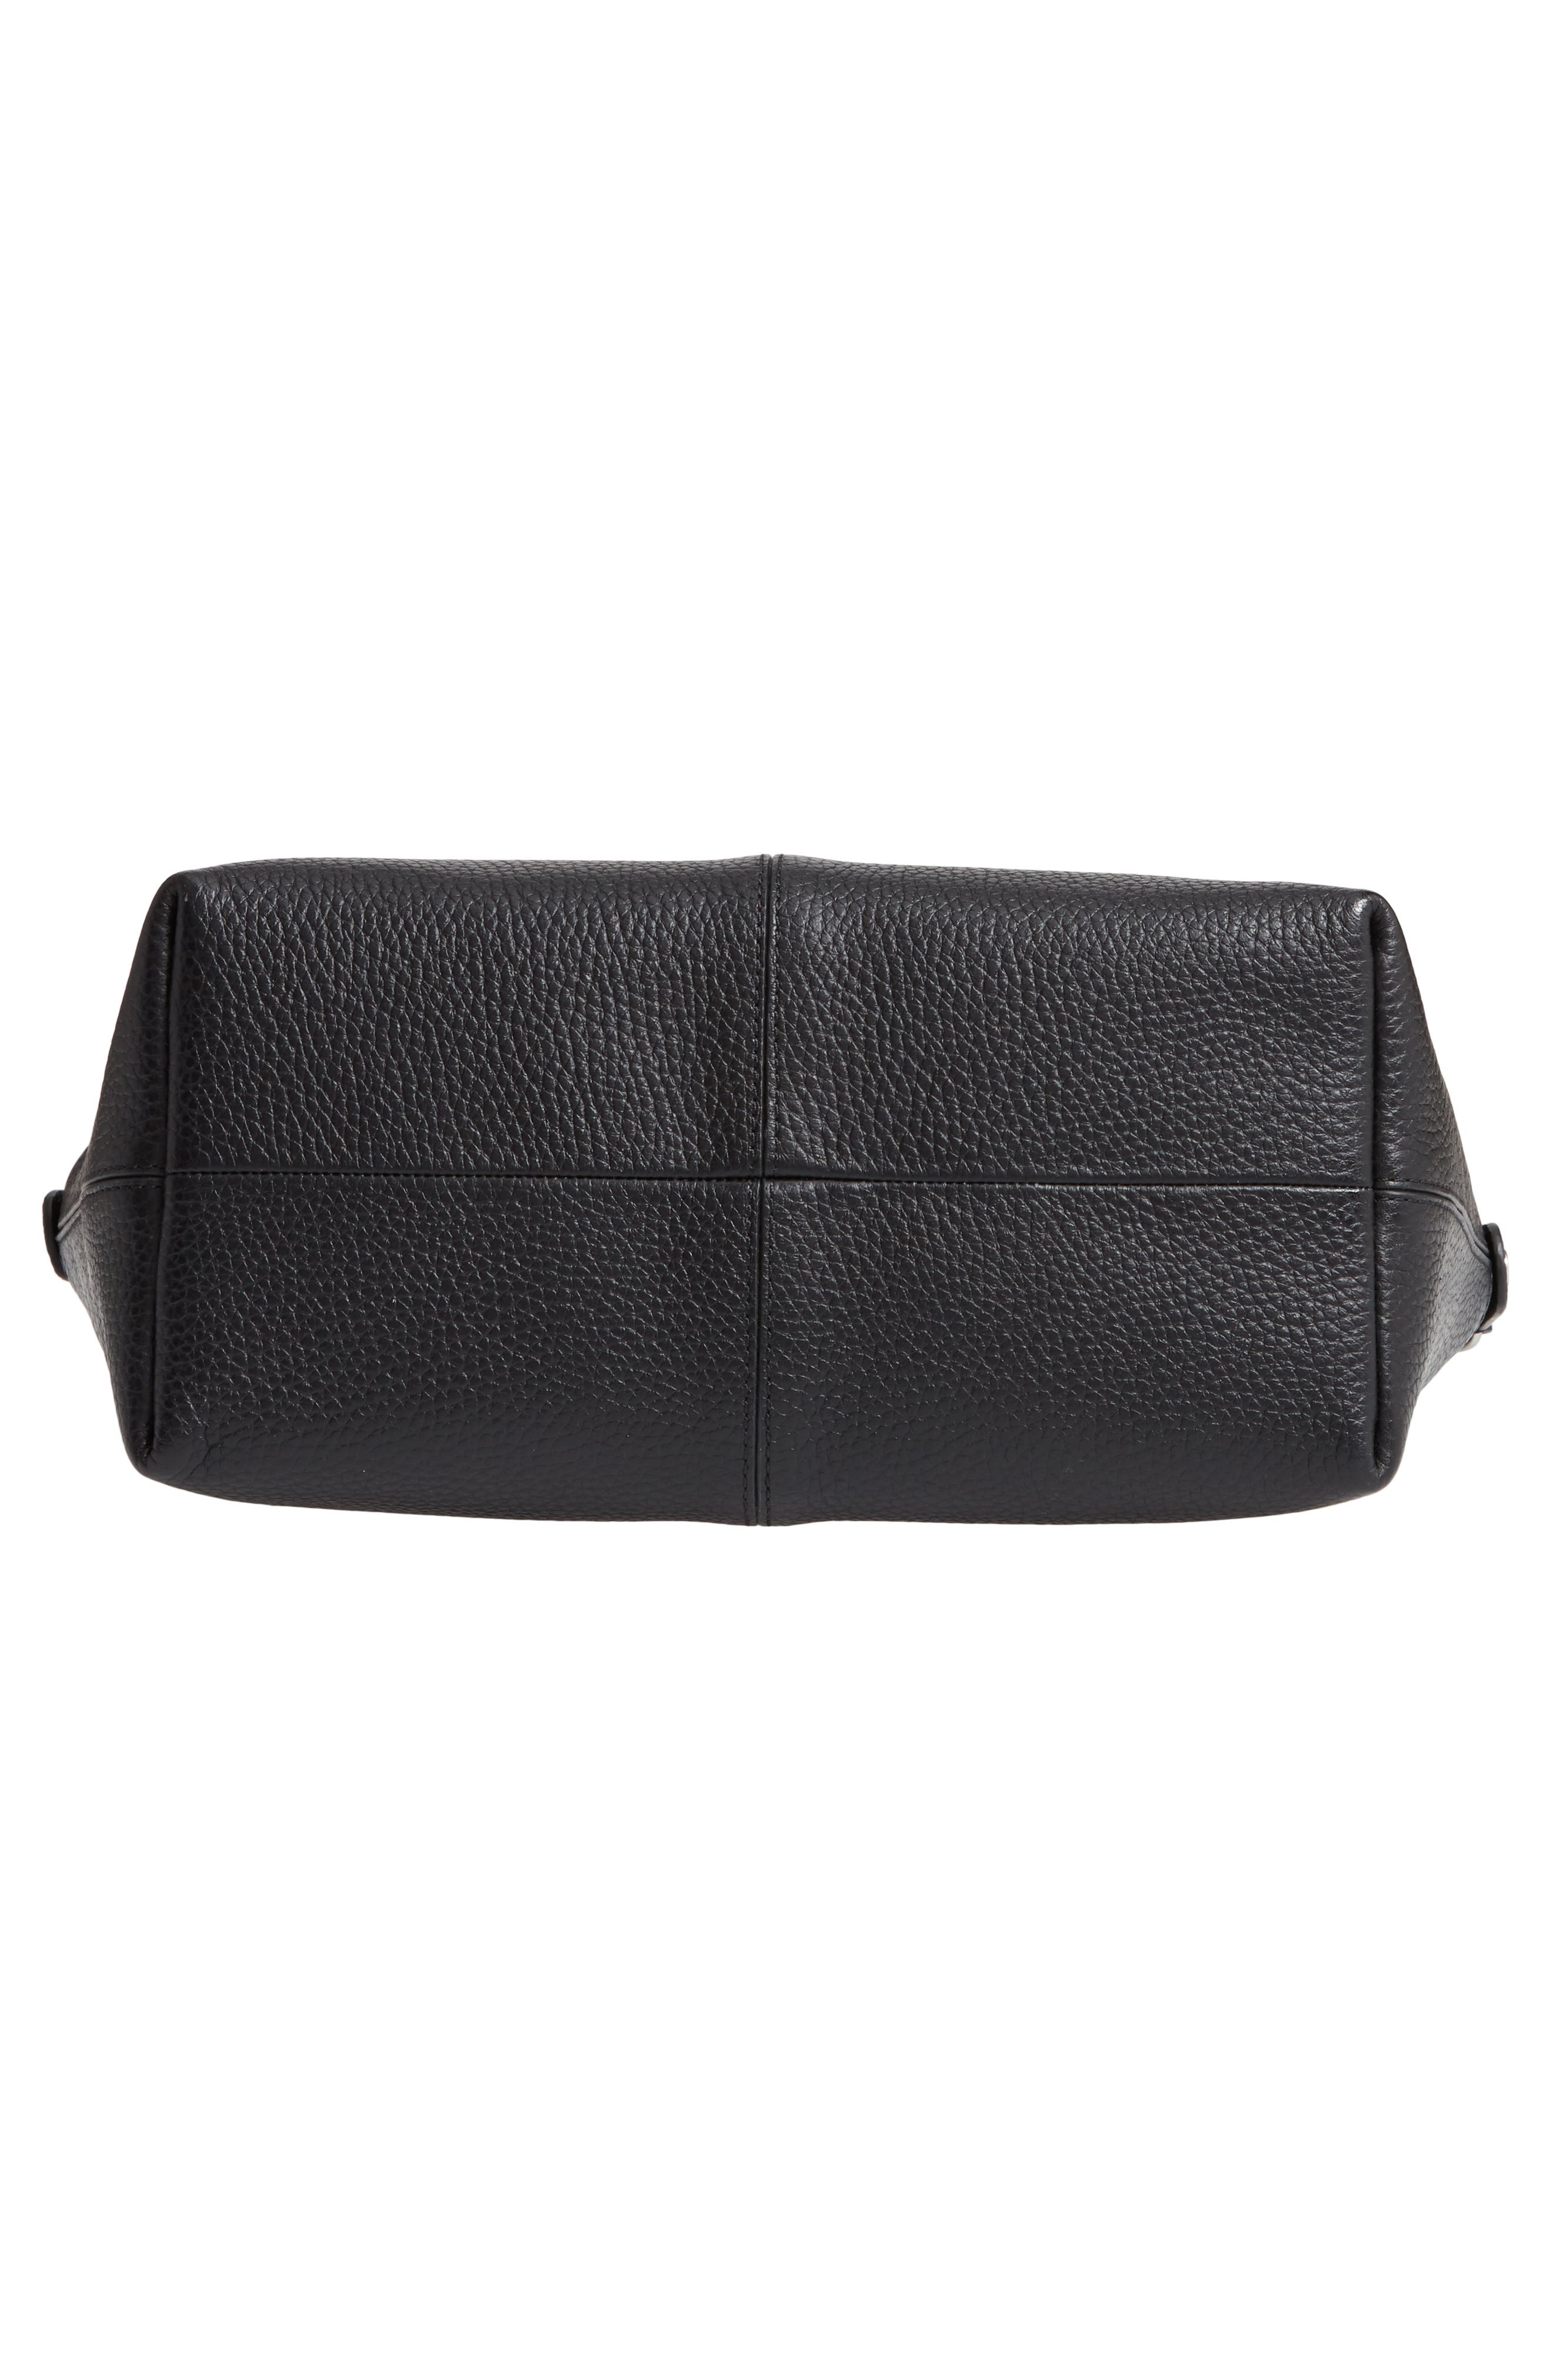 Nevyn Leather Messenger Bag,                             Alternate thumbnail 6, color,                             BLACK